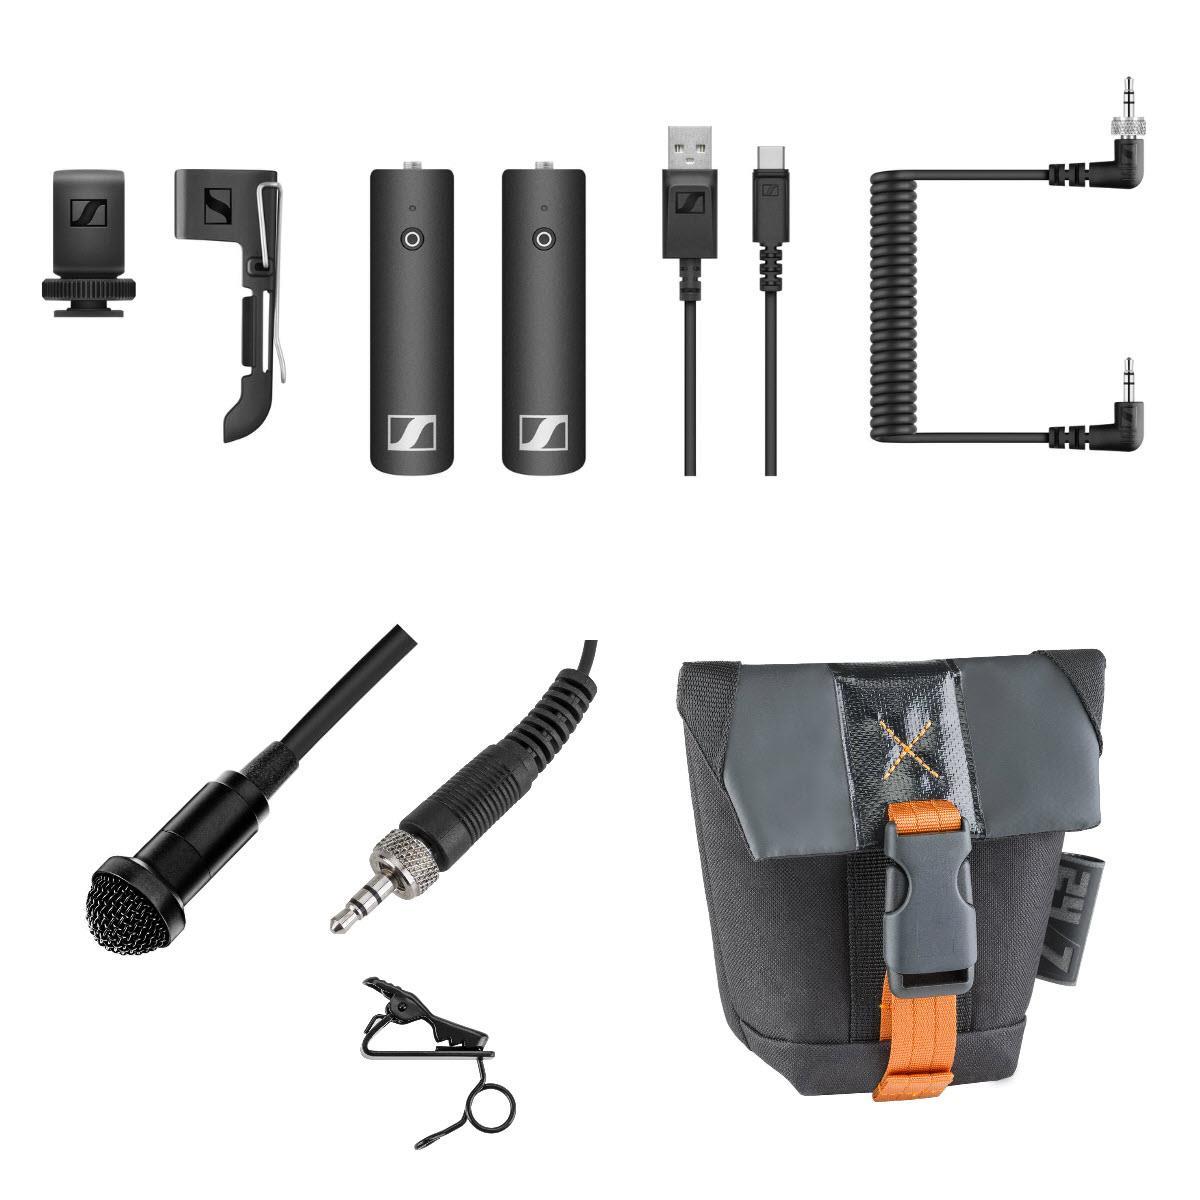 Sennheiser XSW-D Wireless Base Set + Pro Omni Lavaliar Mic + Pouch Bag $179 + free s/h